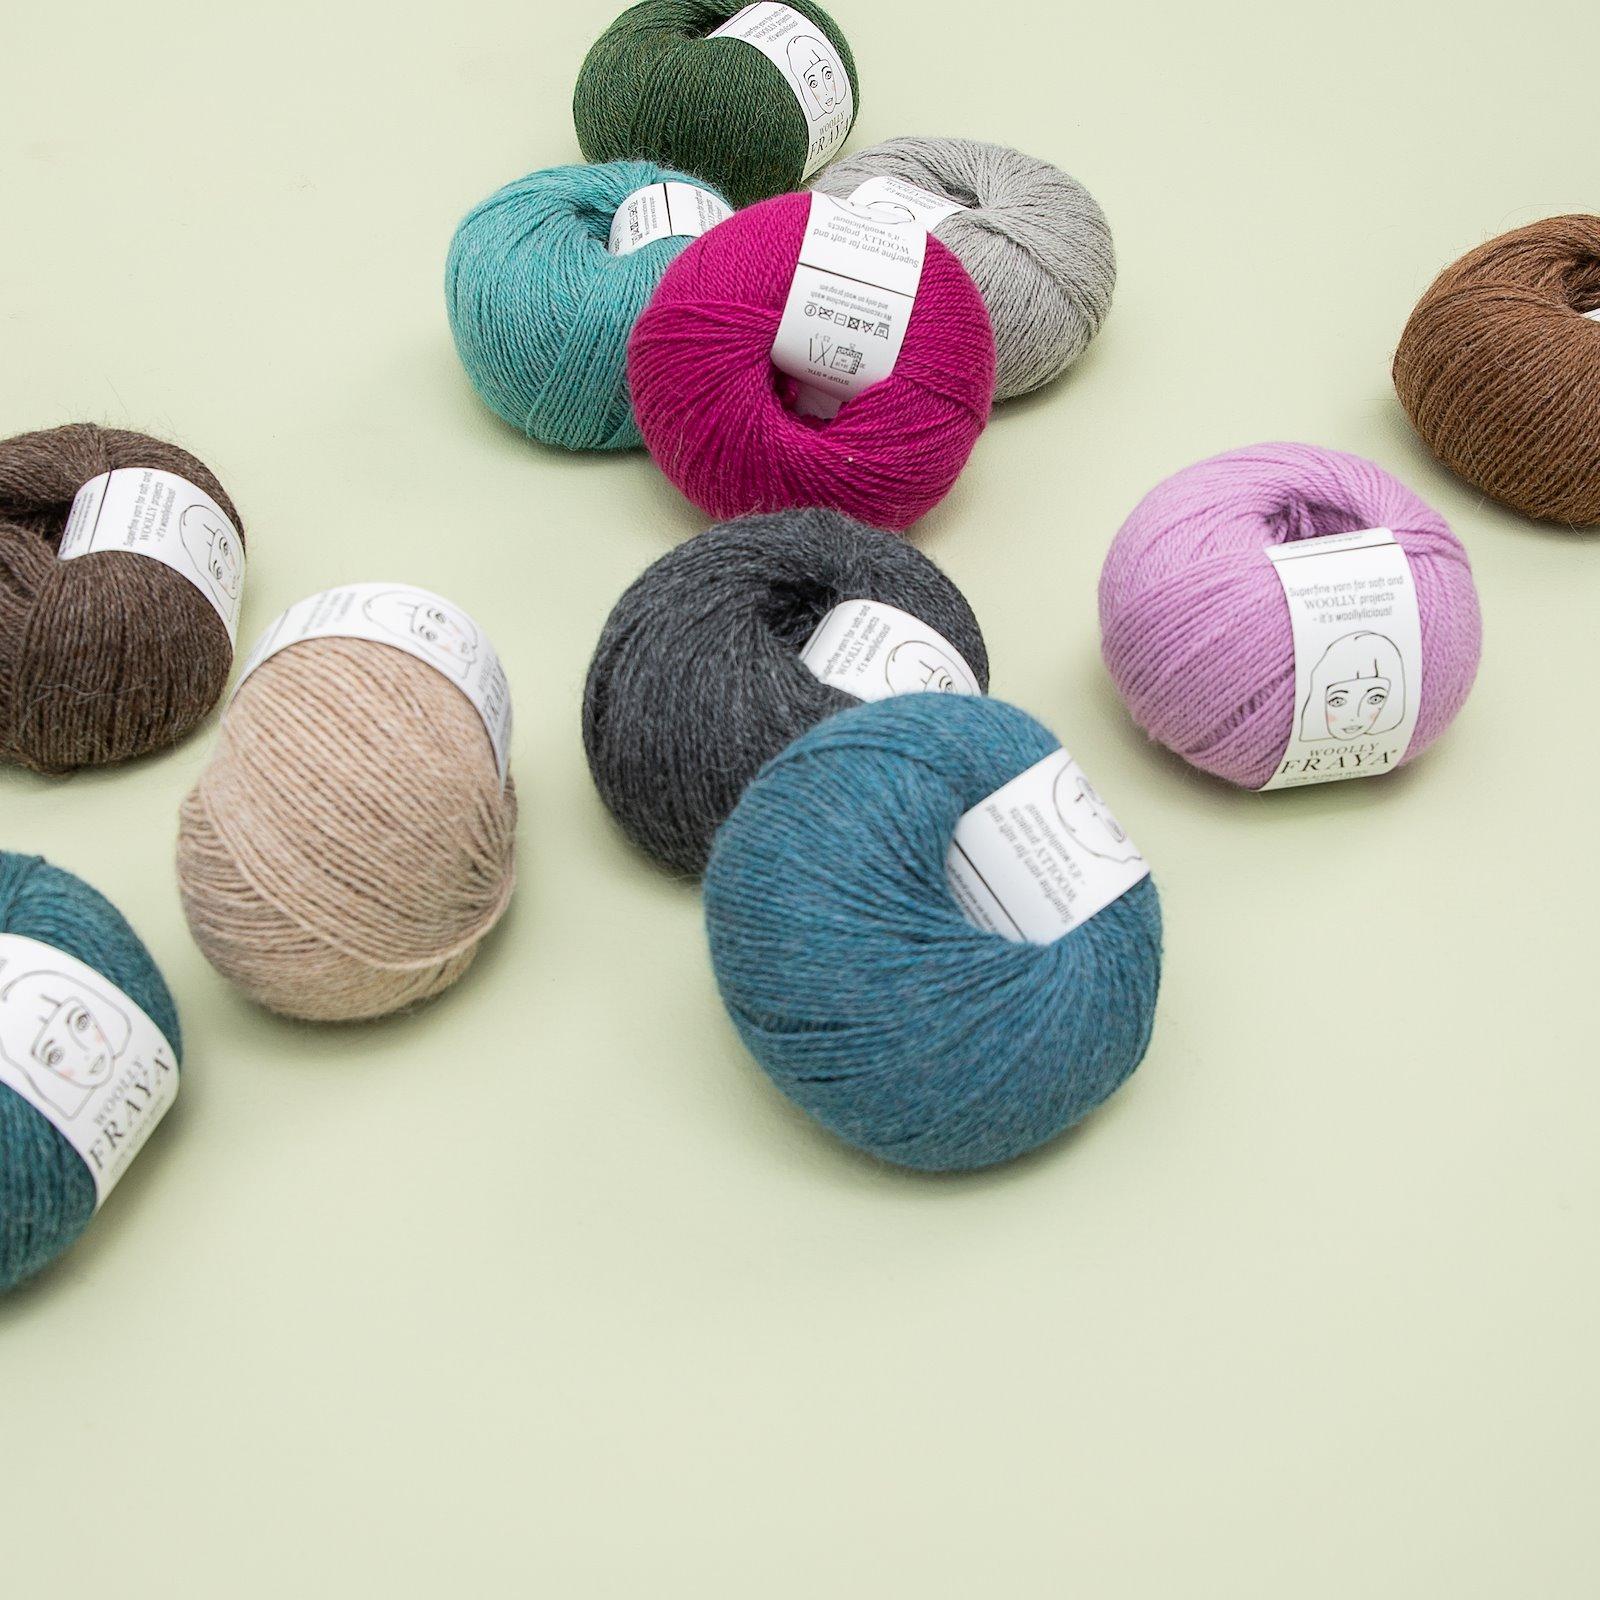 Woolly 50g light grey 90000071_90000072_90000073_90000079_90000080_bundle